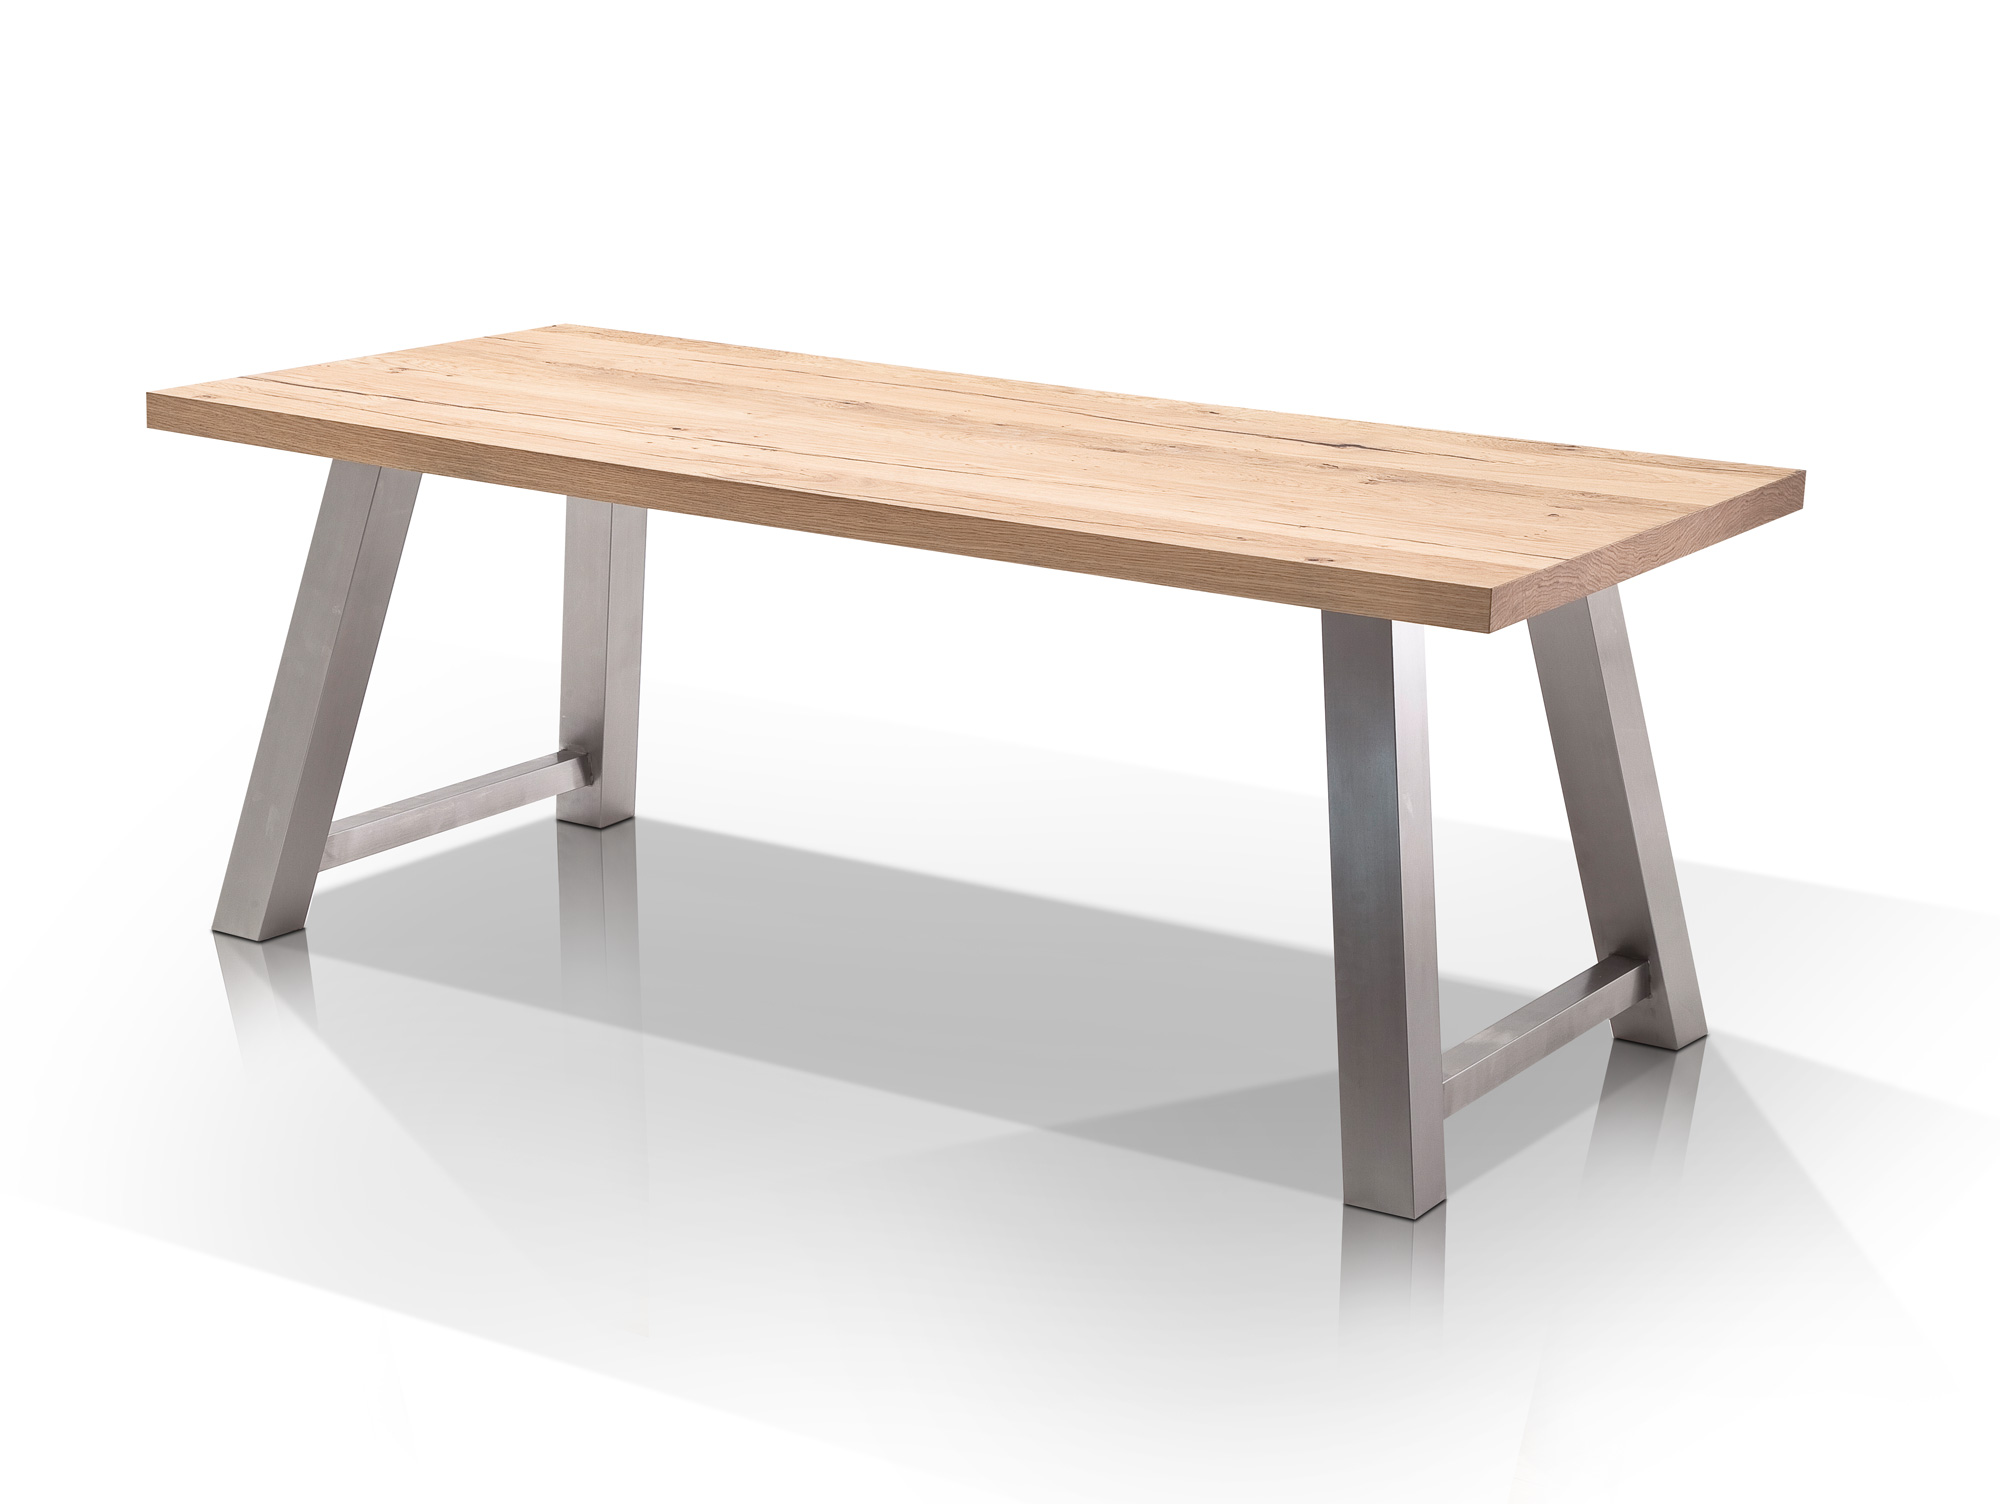 amino massivholzesstisch 200 x 100 cm eiche natur. Black Bedroom Furniture Sets. Home Design Ideas